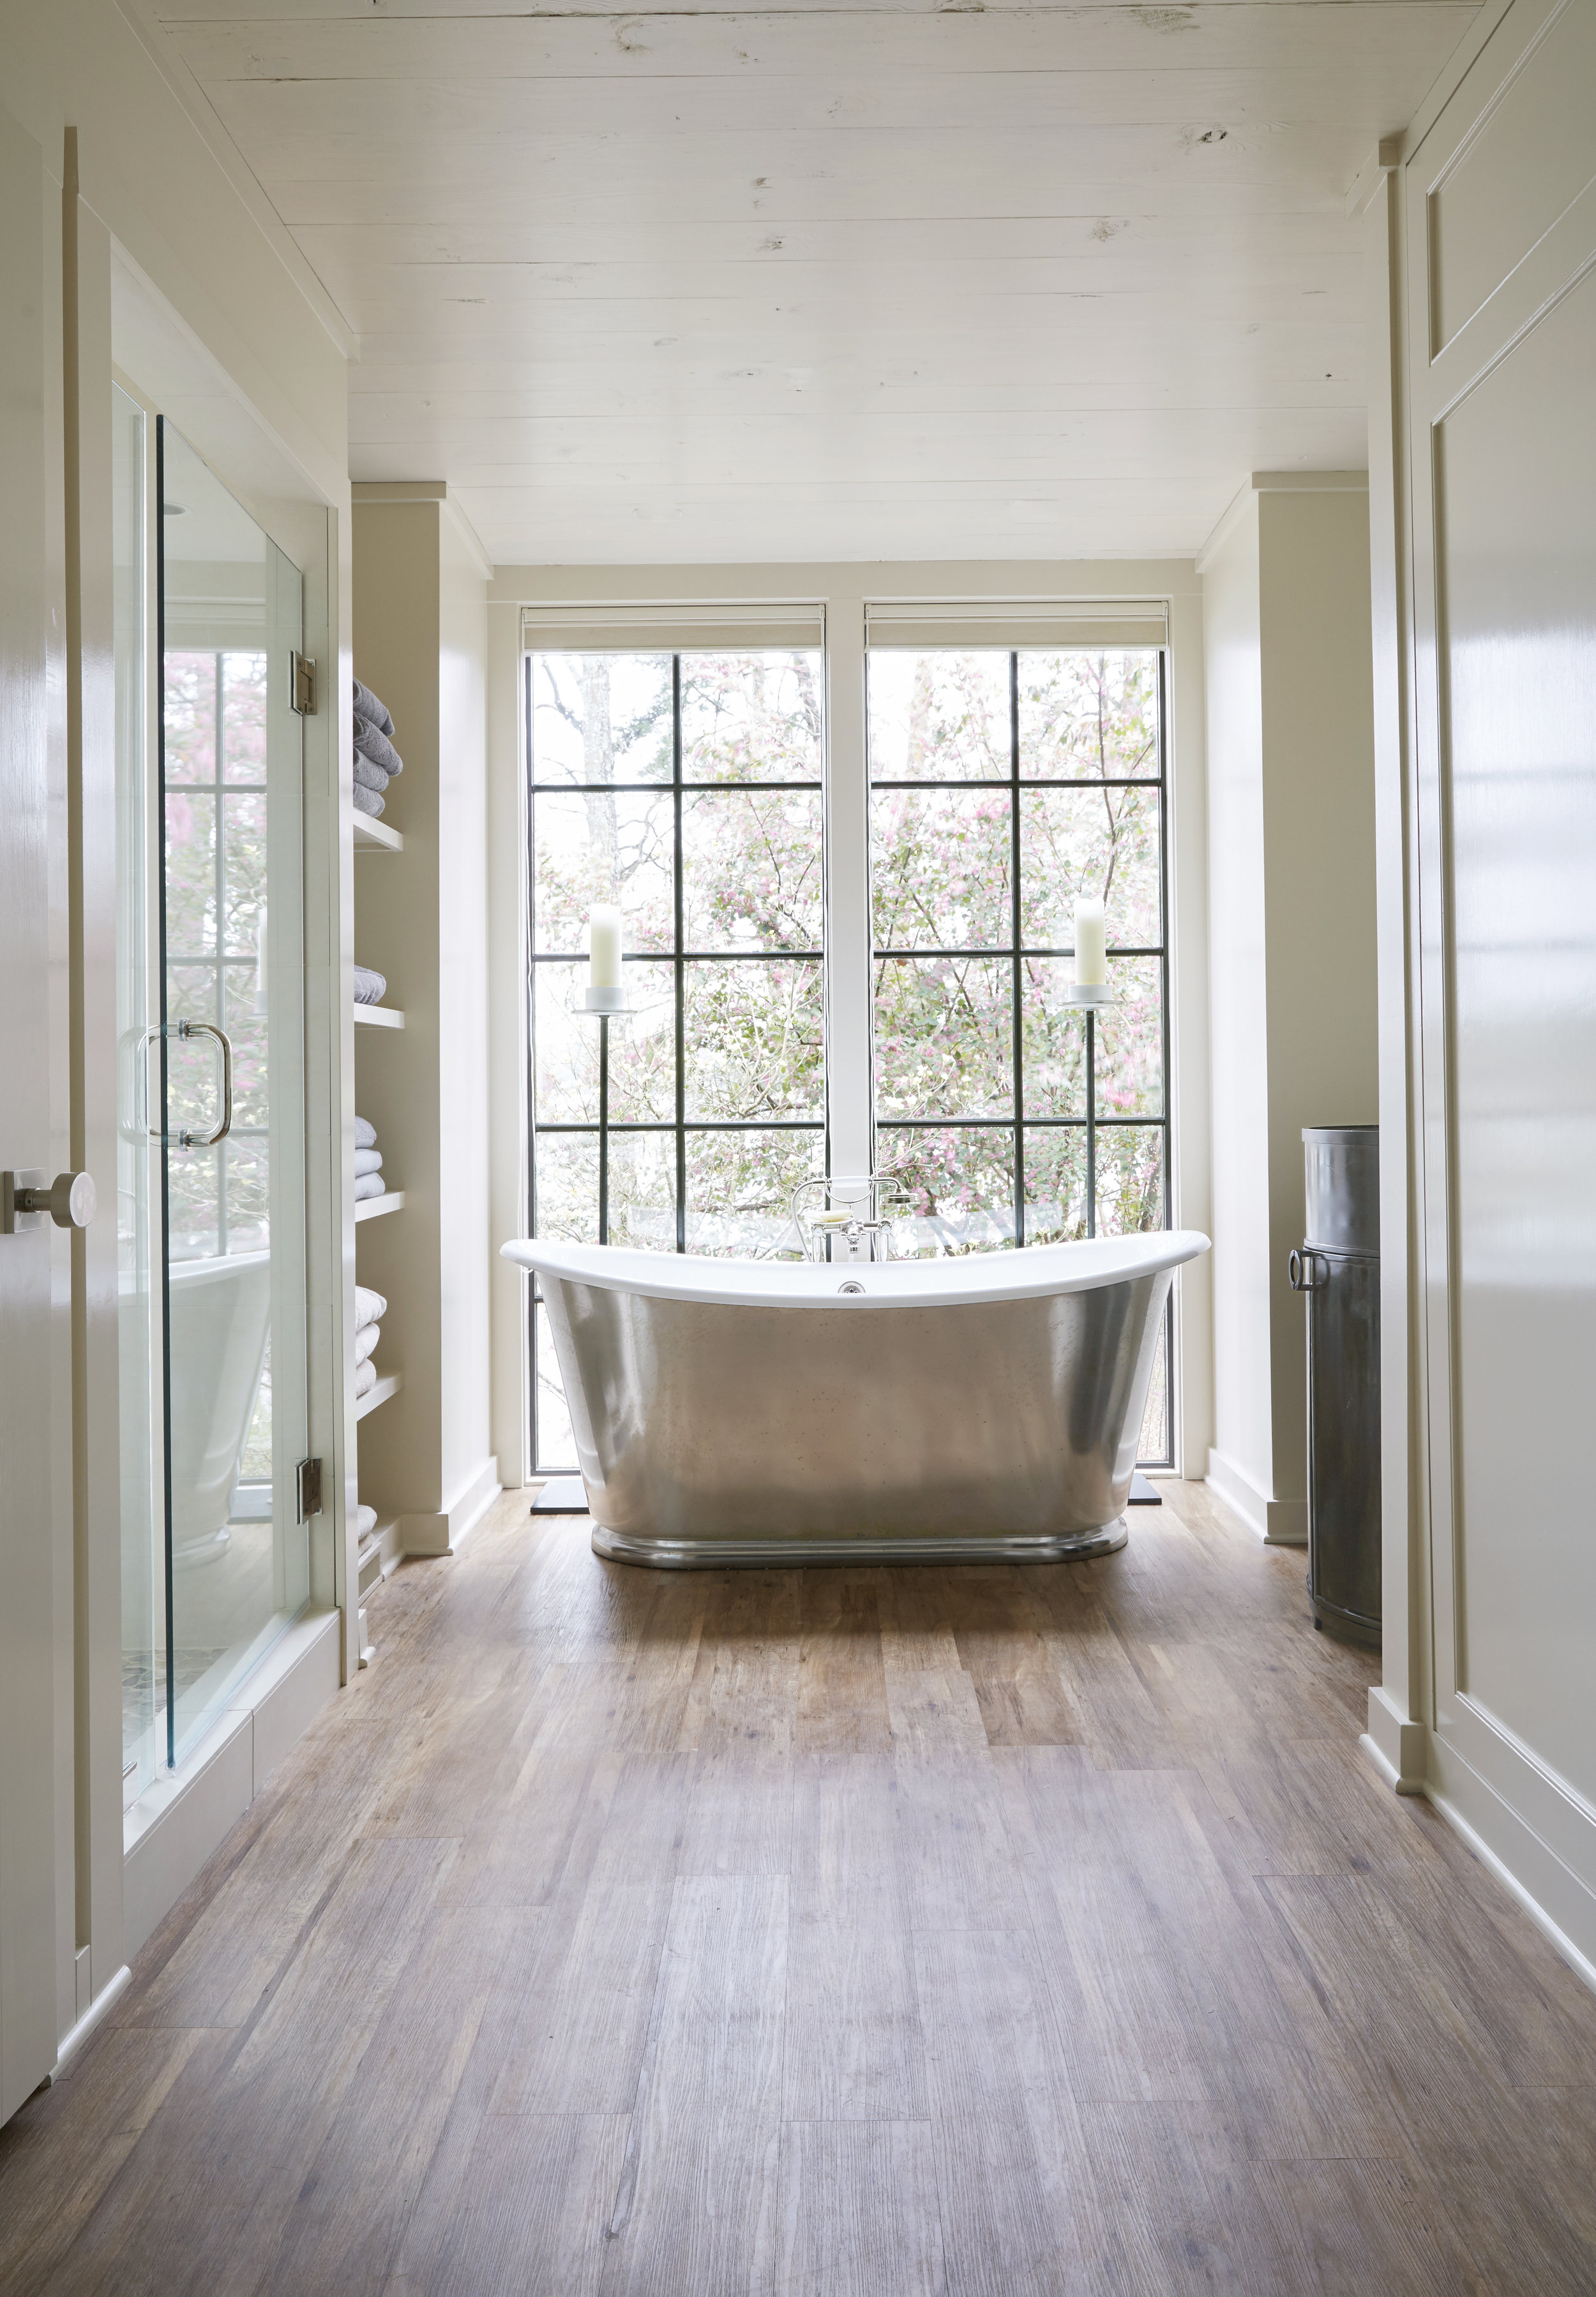 Seven Sticks Lake House Bathroom tub interior architecture Alabama